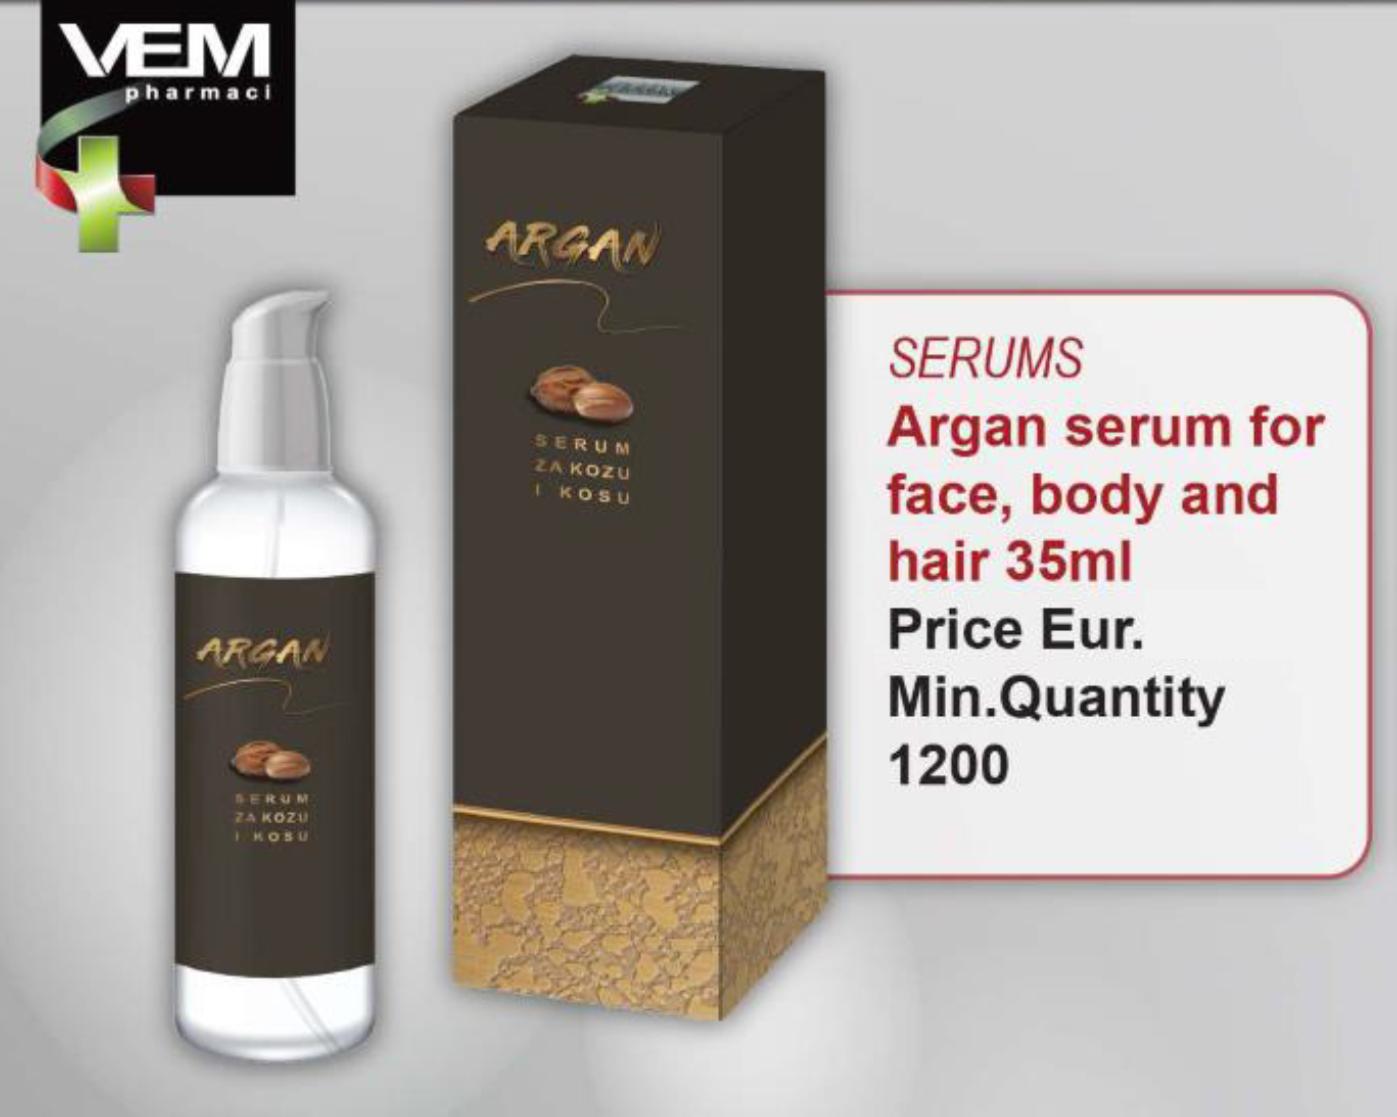 Argan Serum